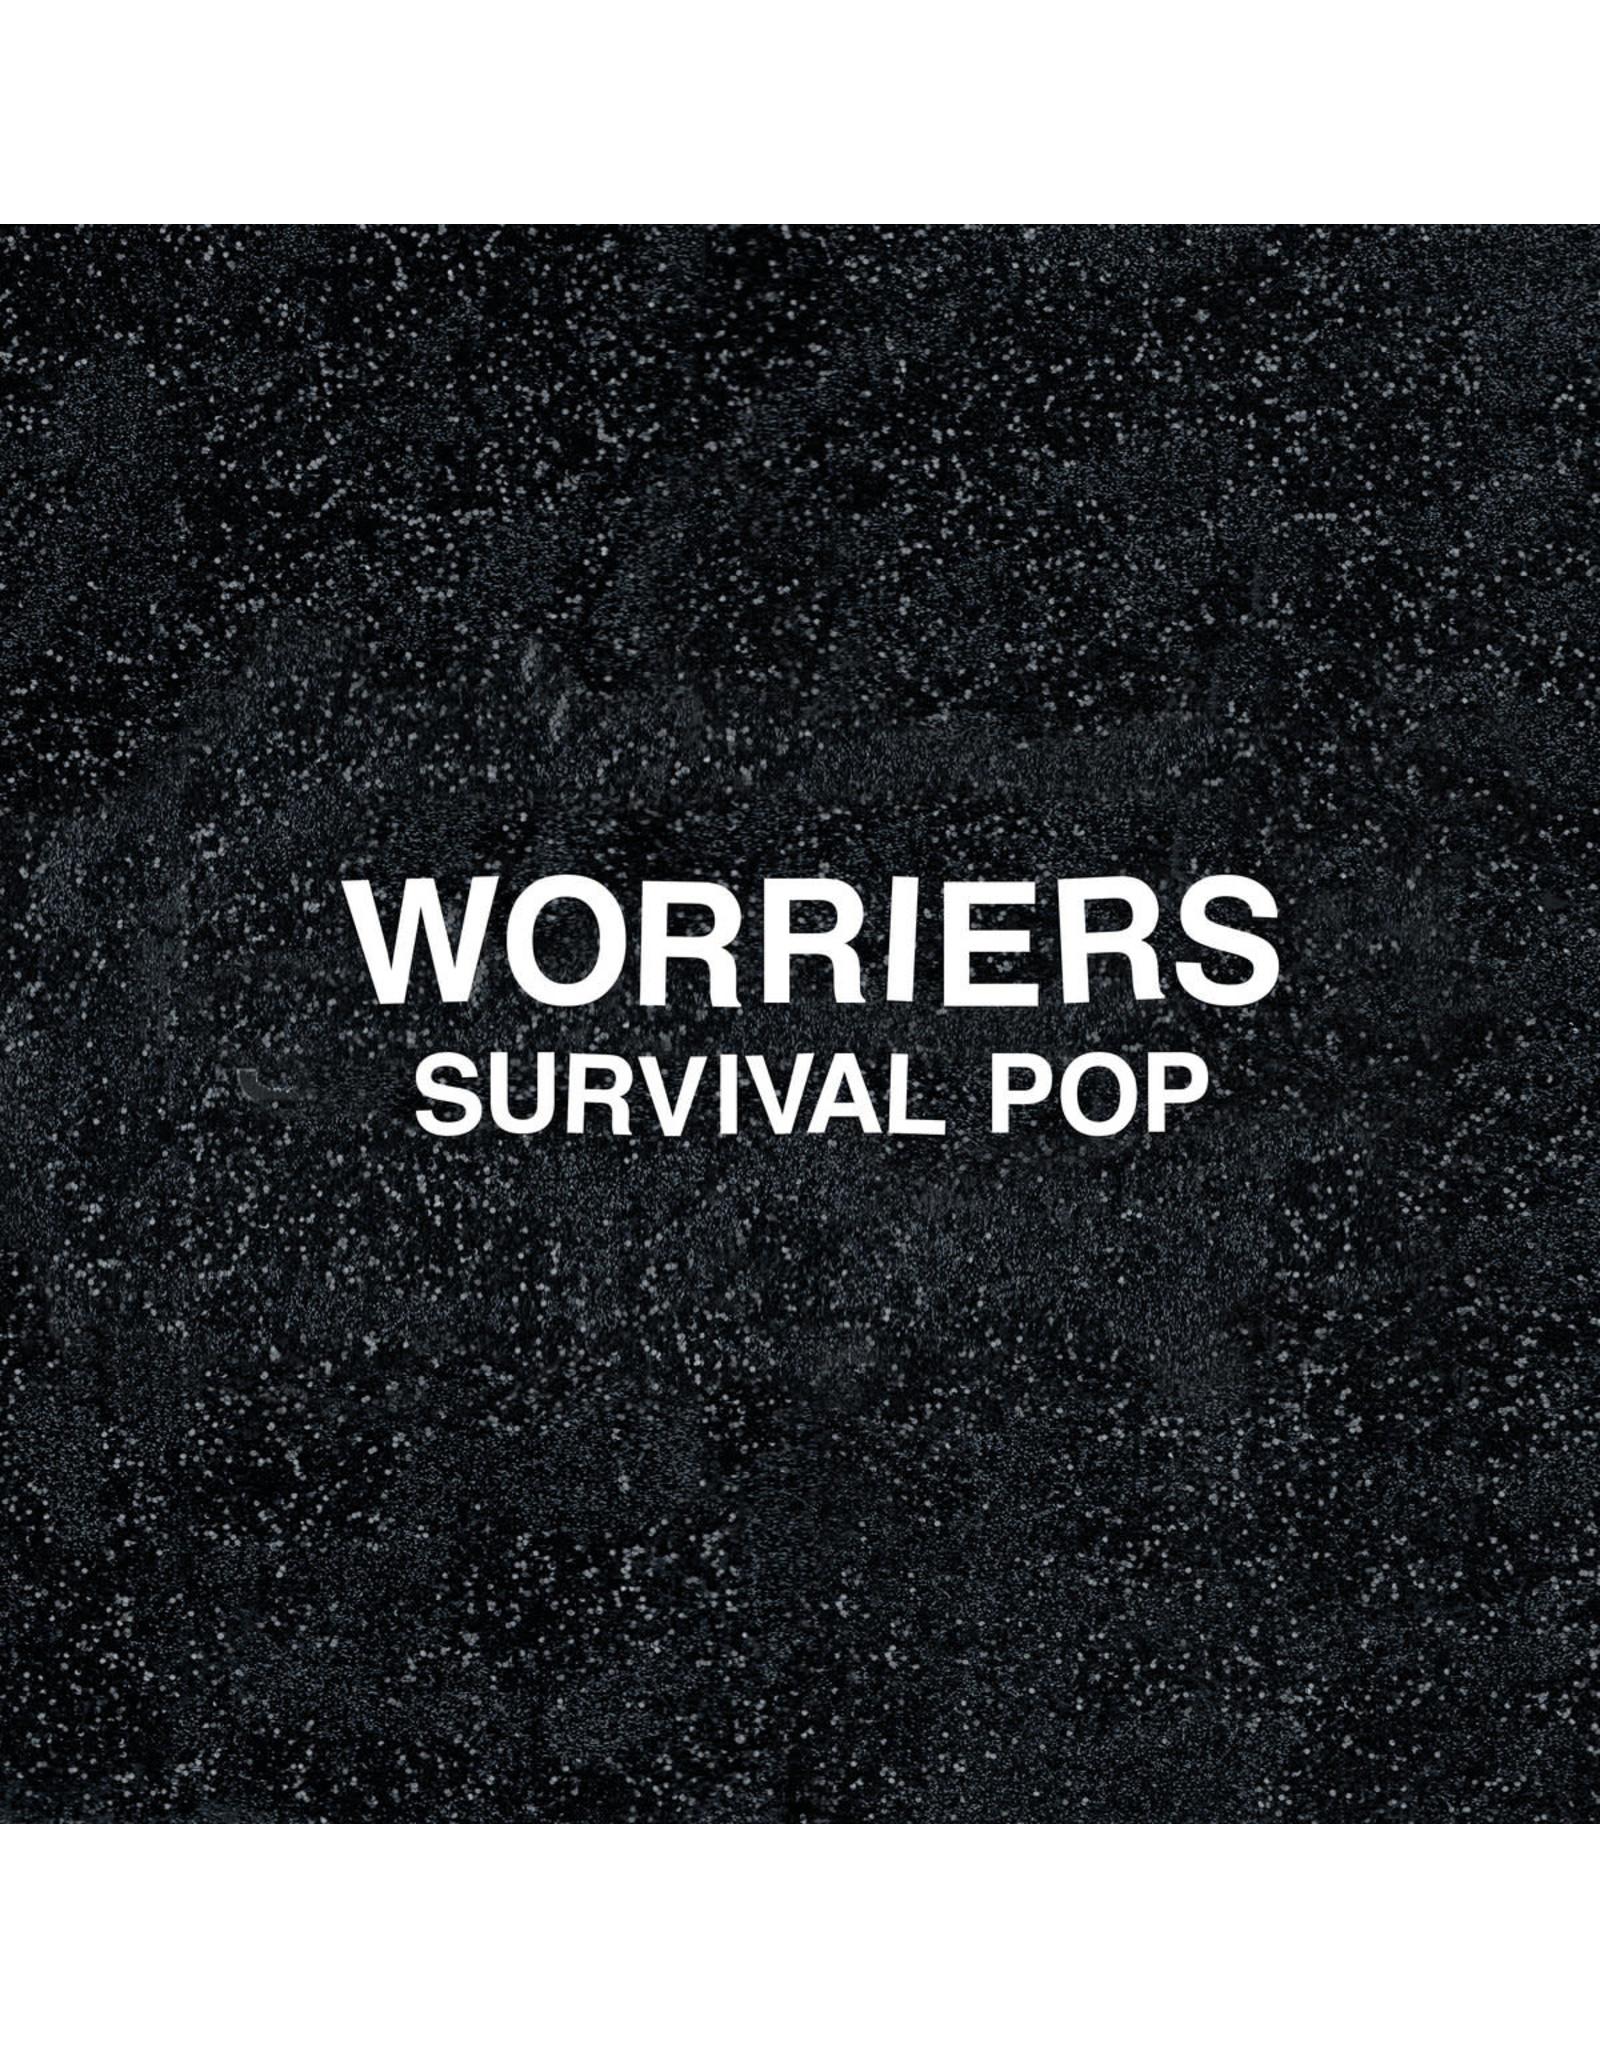 Worriers - Survival Pop (Ltd red vinyl)